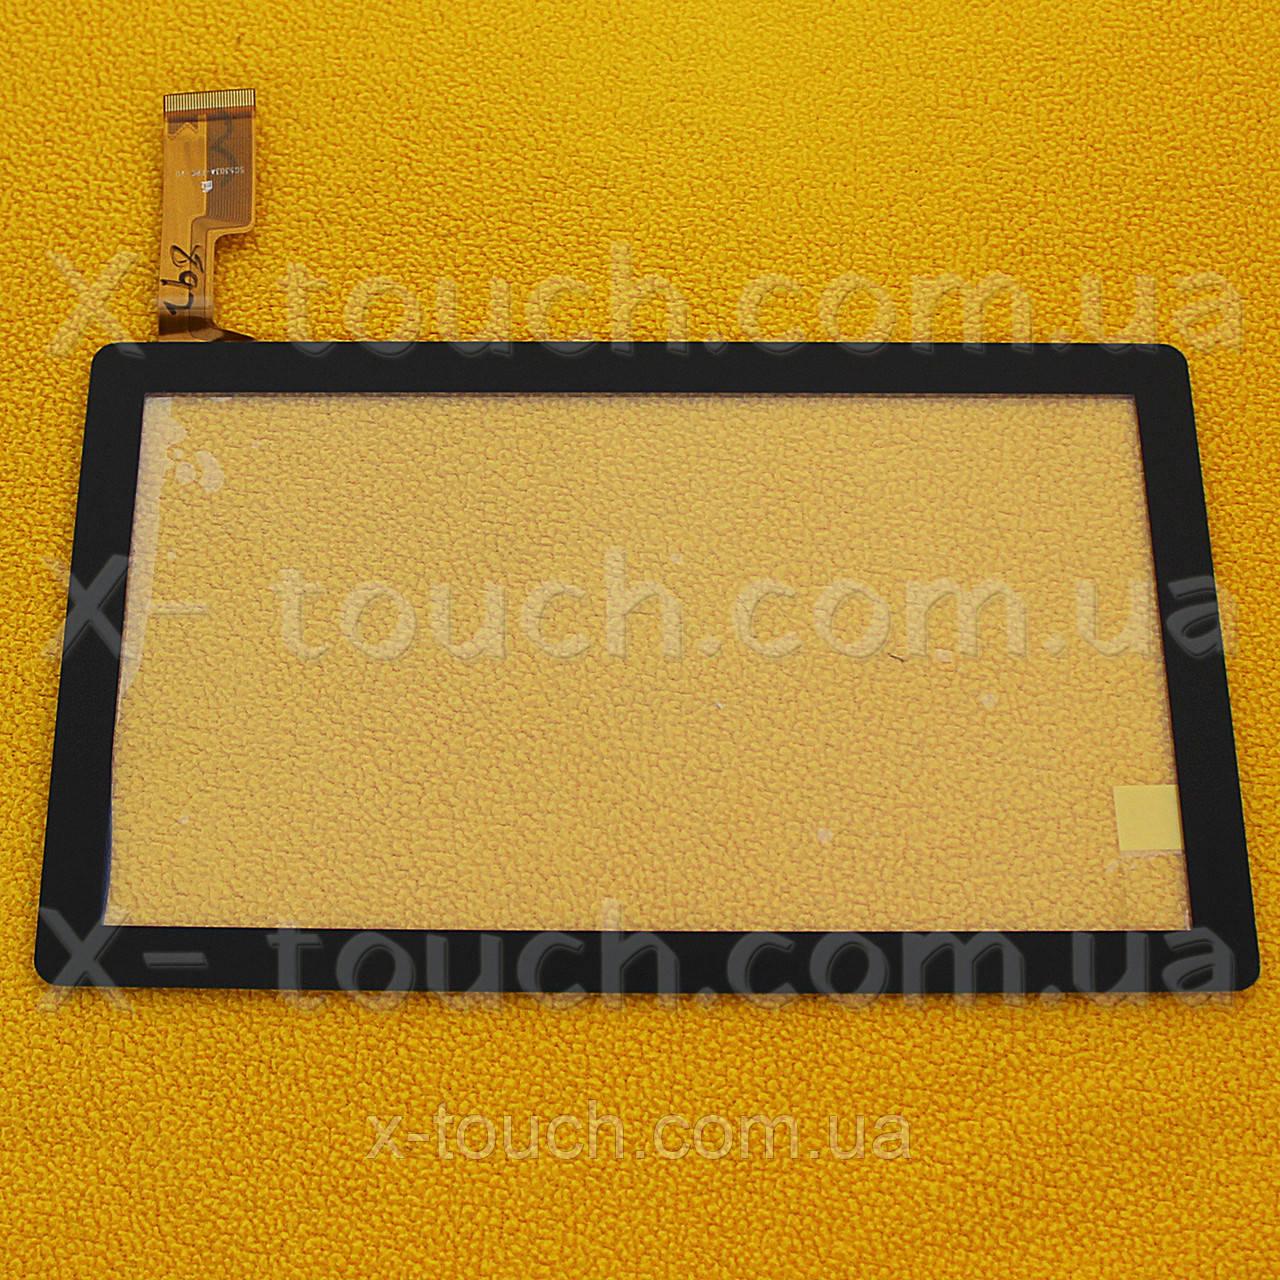 Тачскрин, сенсор  HJ003PCG00A-FPC  для планшета